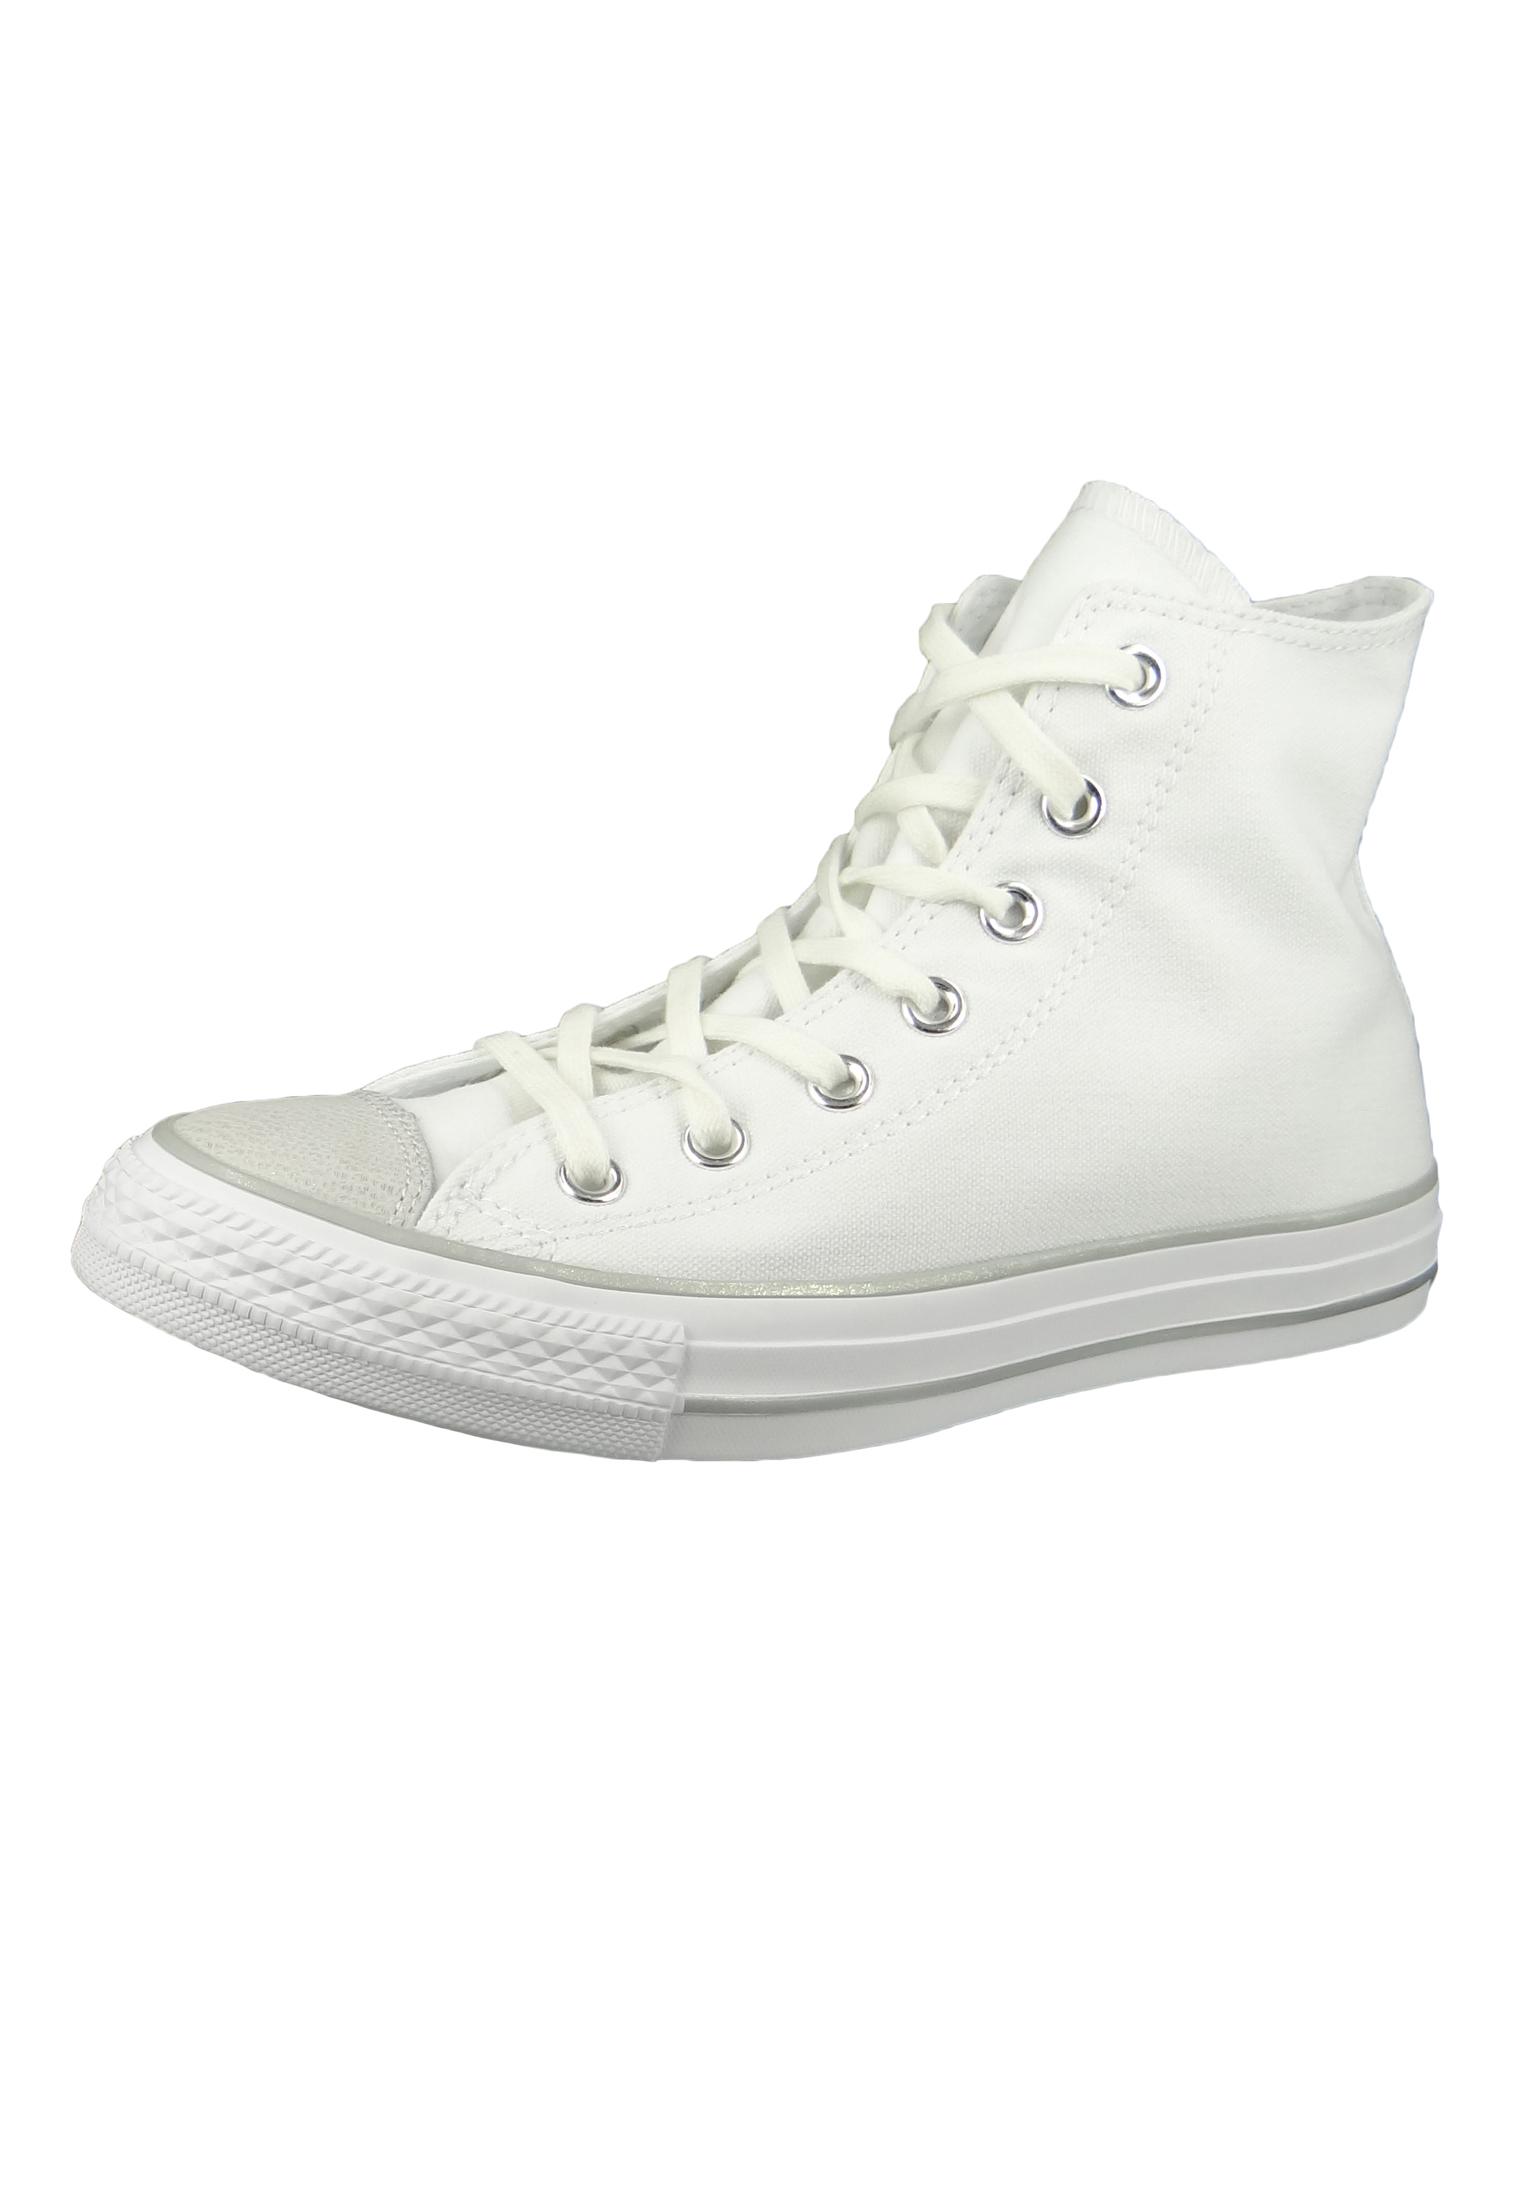 Converse Chucks Weiss 559886C Chuck Taylor All Star HI HI HI Weiß Silver ... 122289